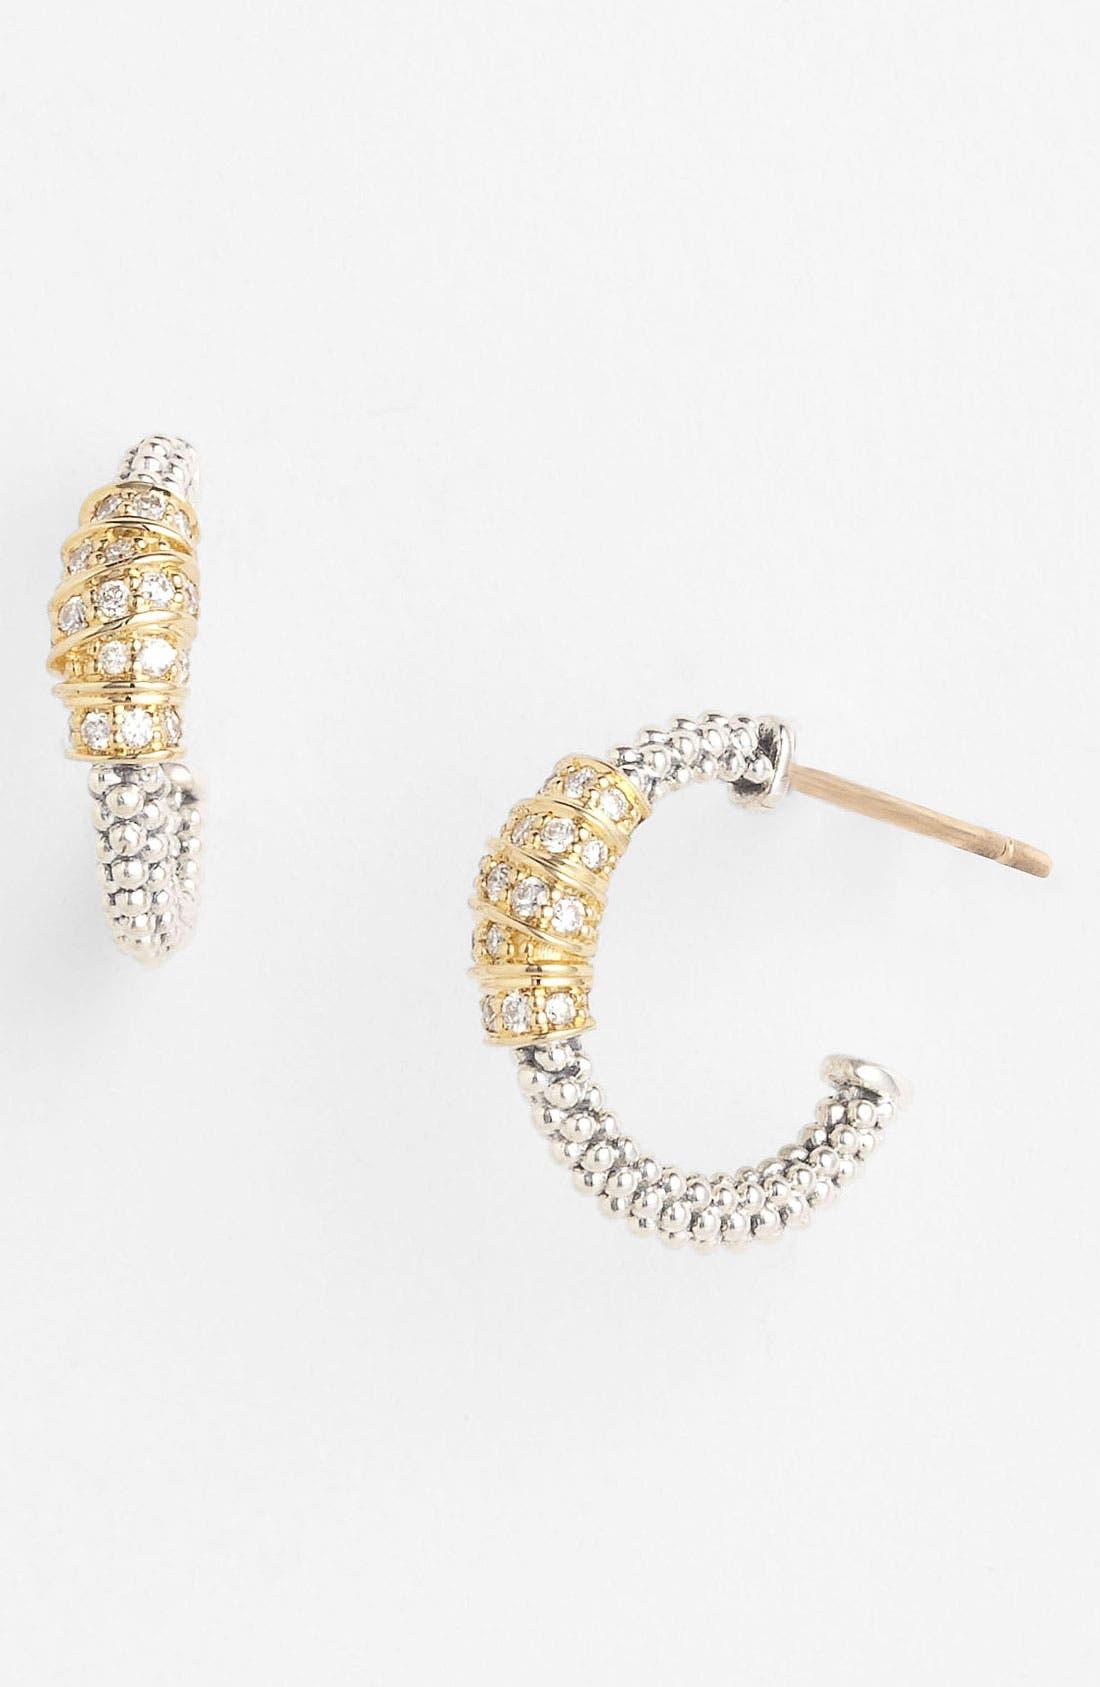 Alternate Image 1 Selected - Lagos 'Embrace' Diamond & Caviar™ Hoop Earrings (Online Only)